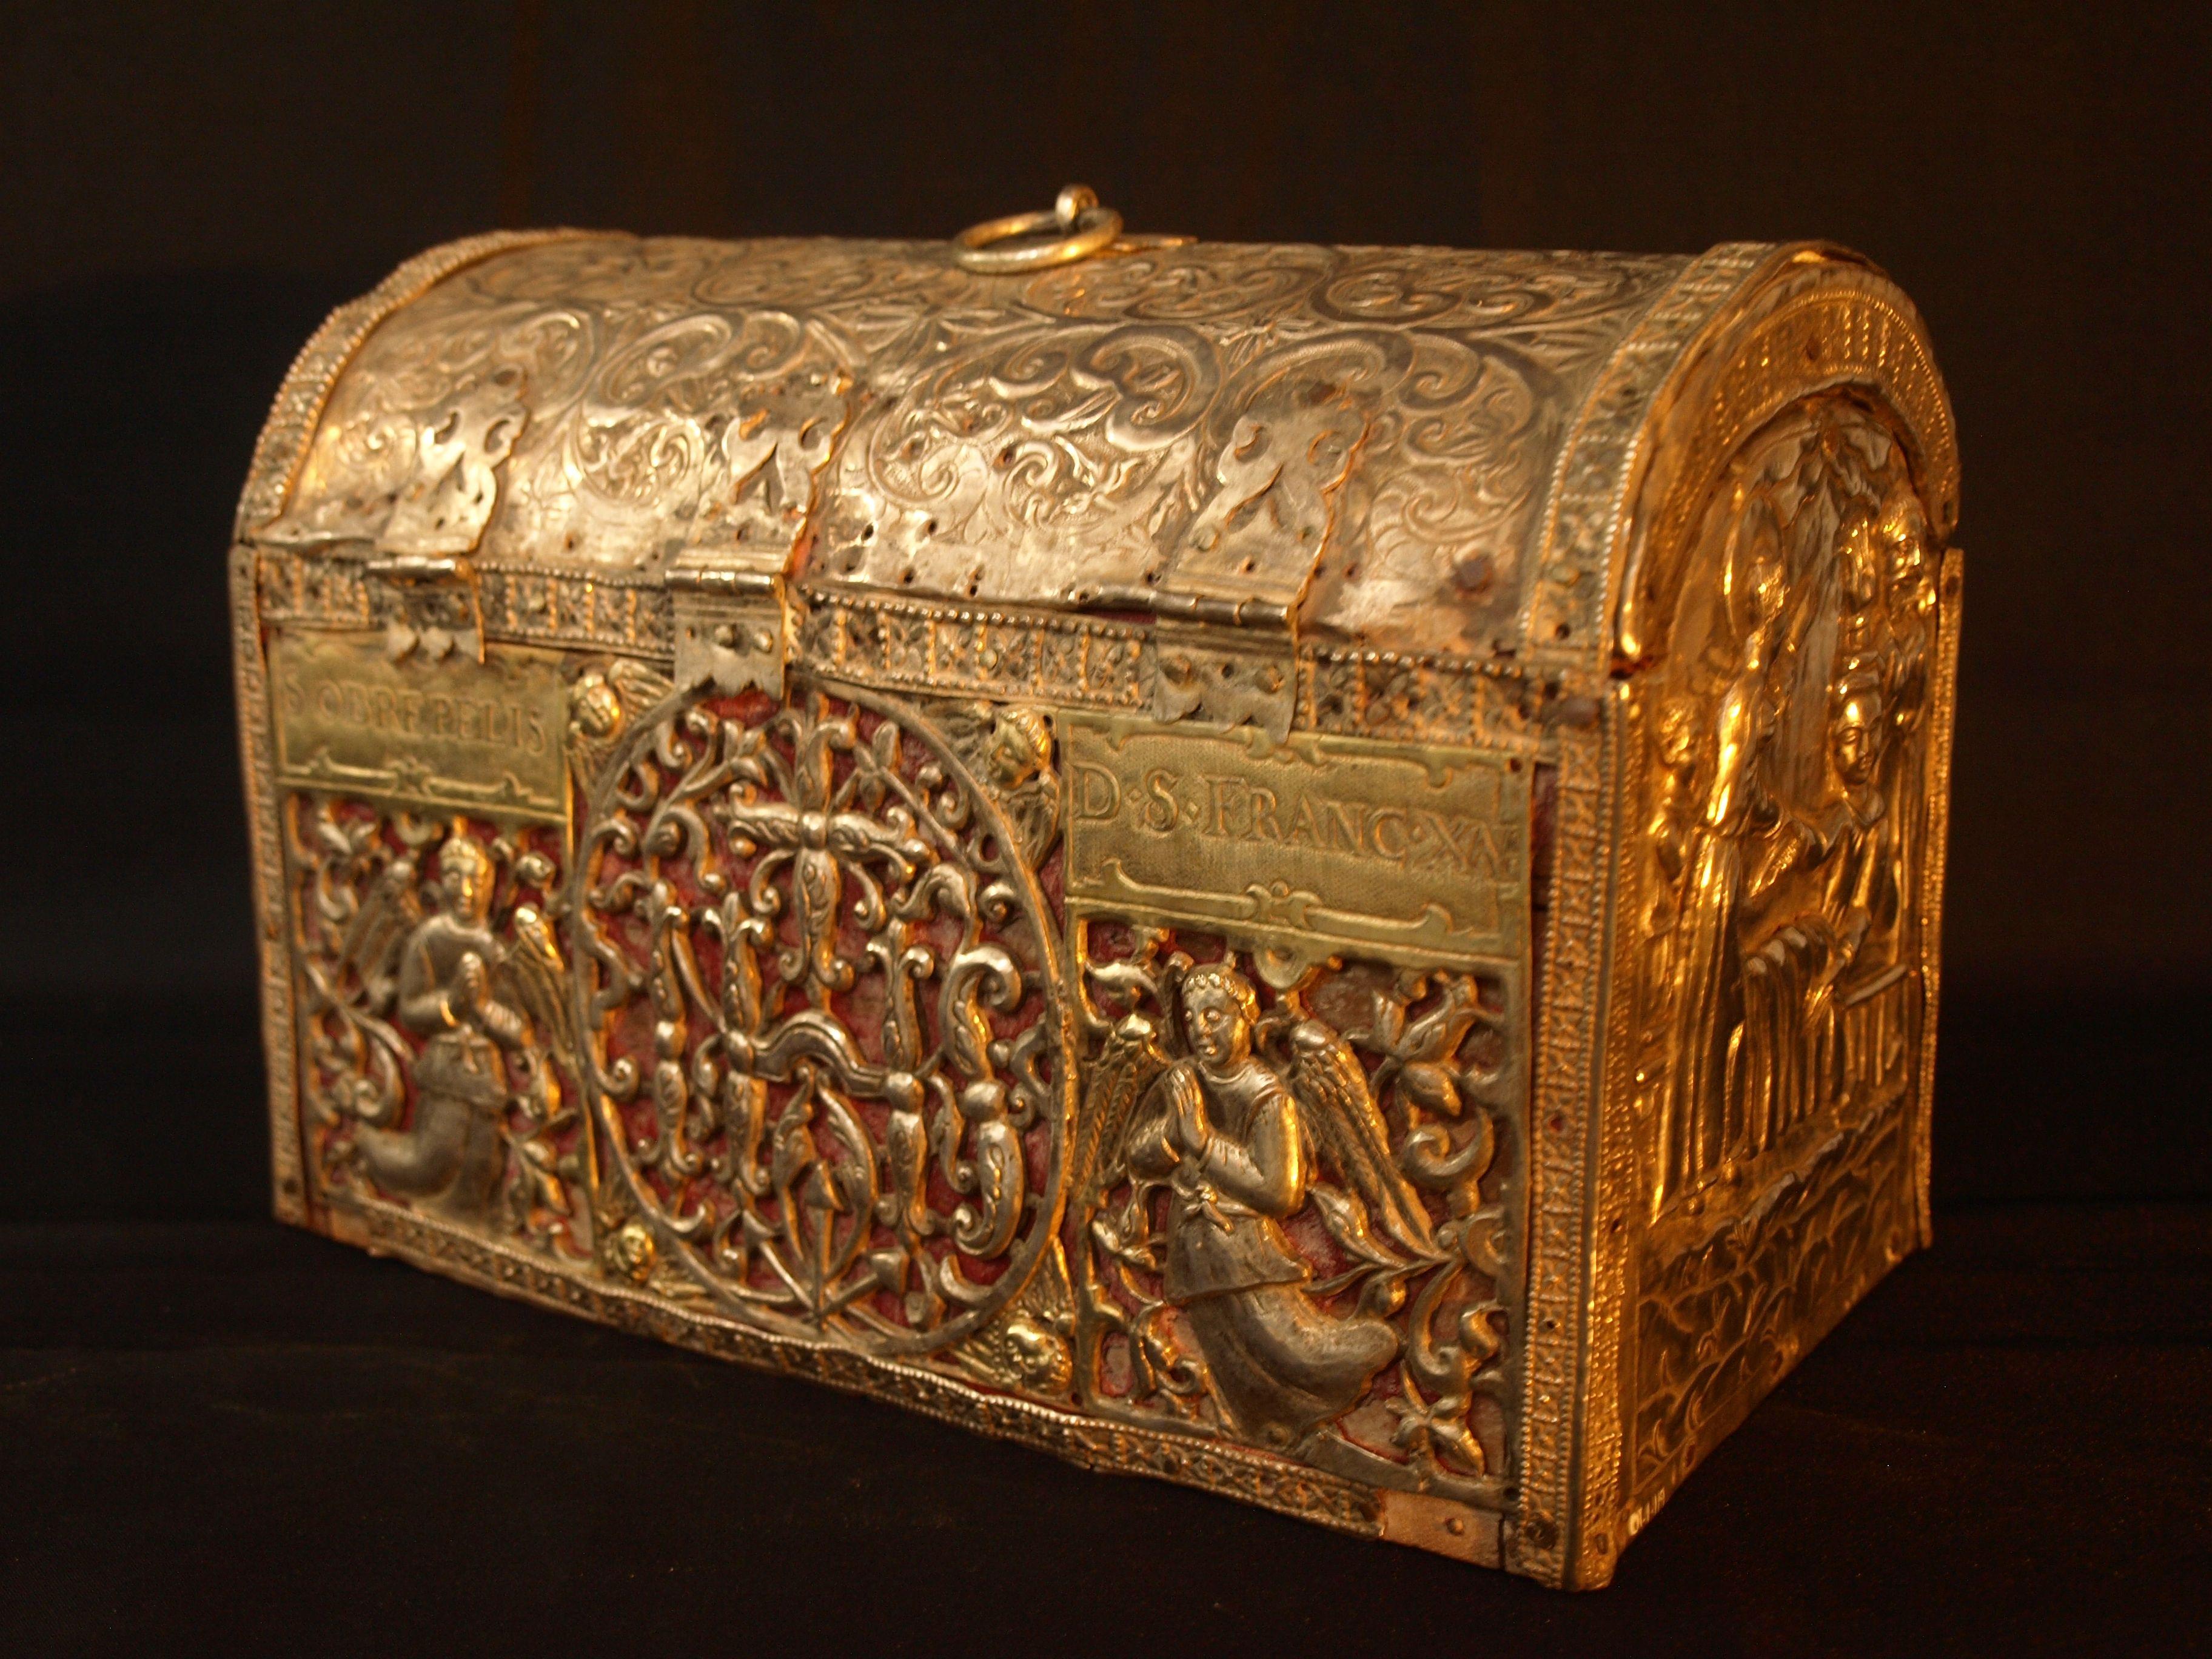 Museum_of_Christian_Art,_Old_Goa,_Goa,_India10_(Reliquary_chest).JPG 3,648×2,736 pixels